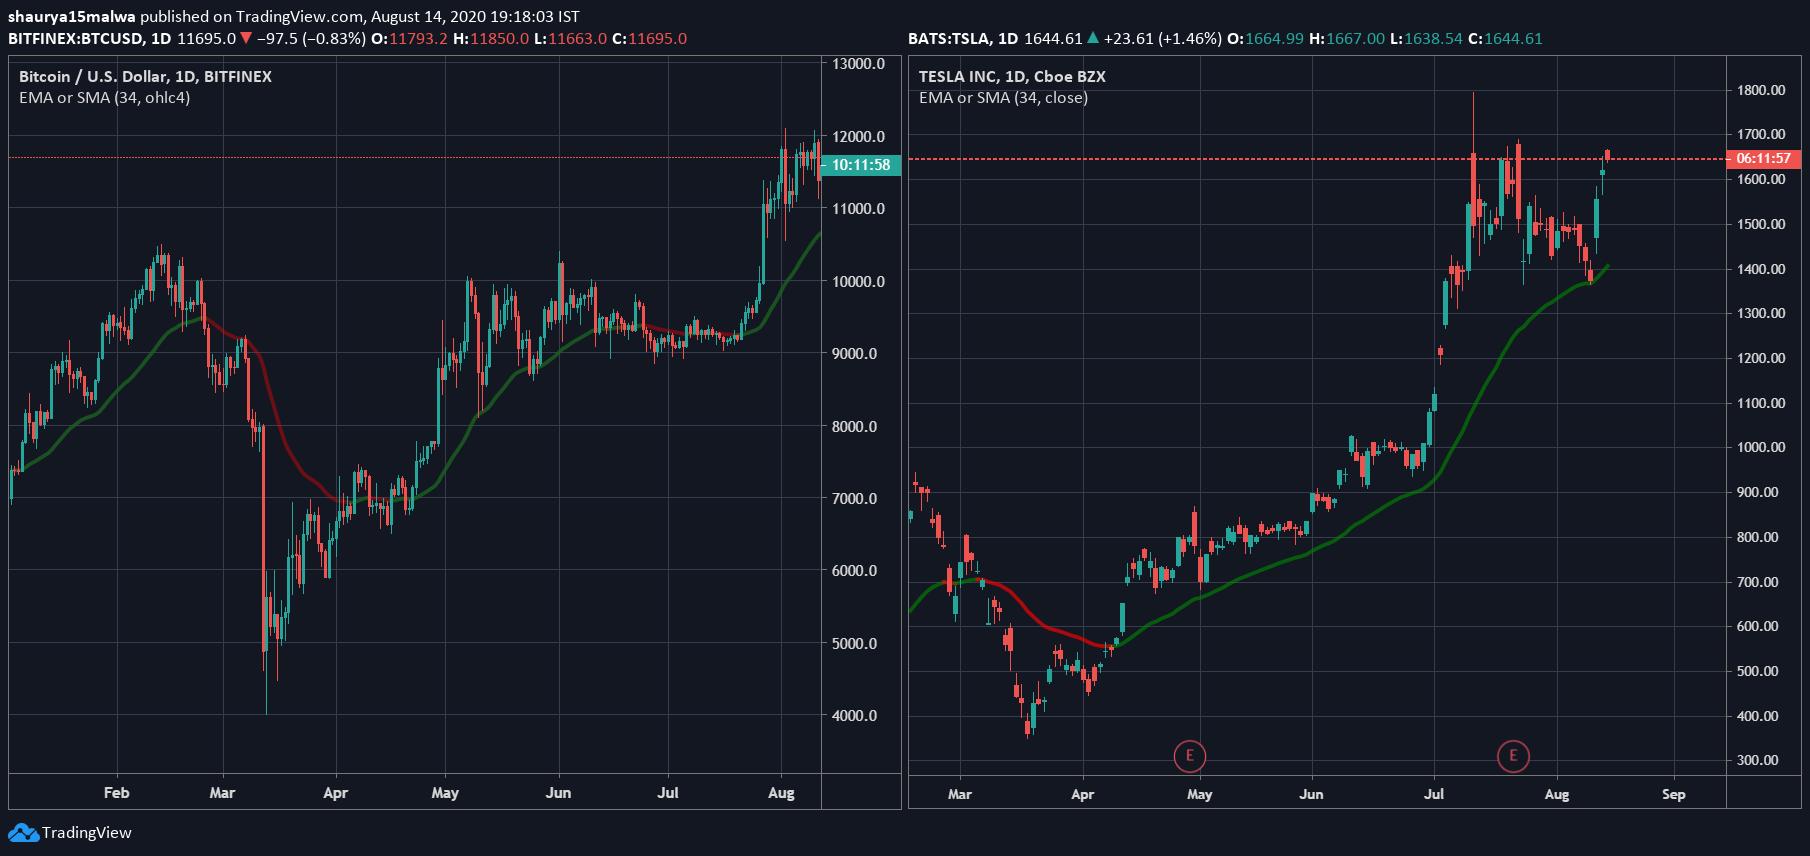 Price chart of Bitcoin and Tesla